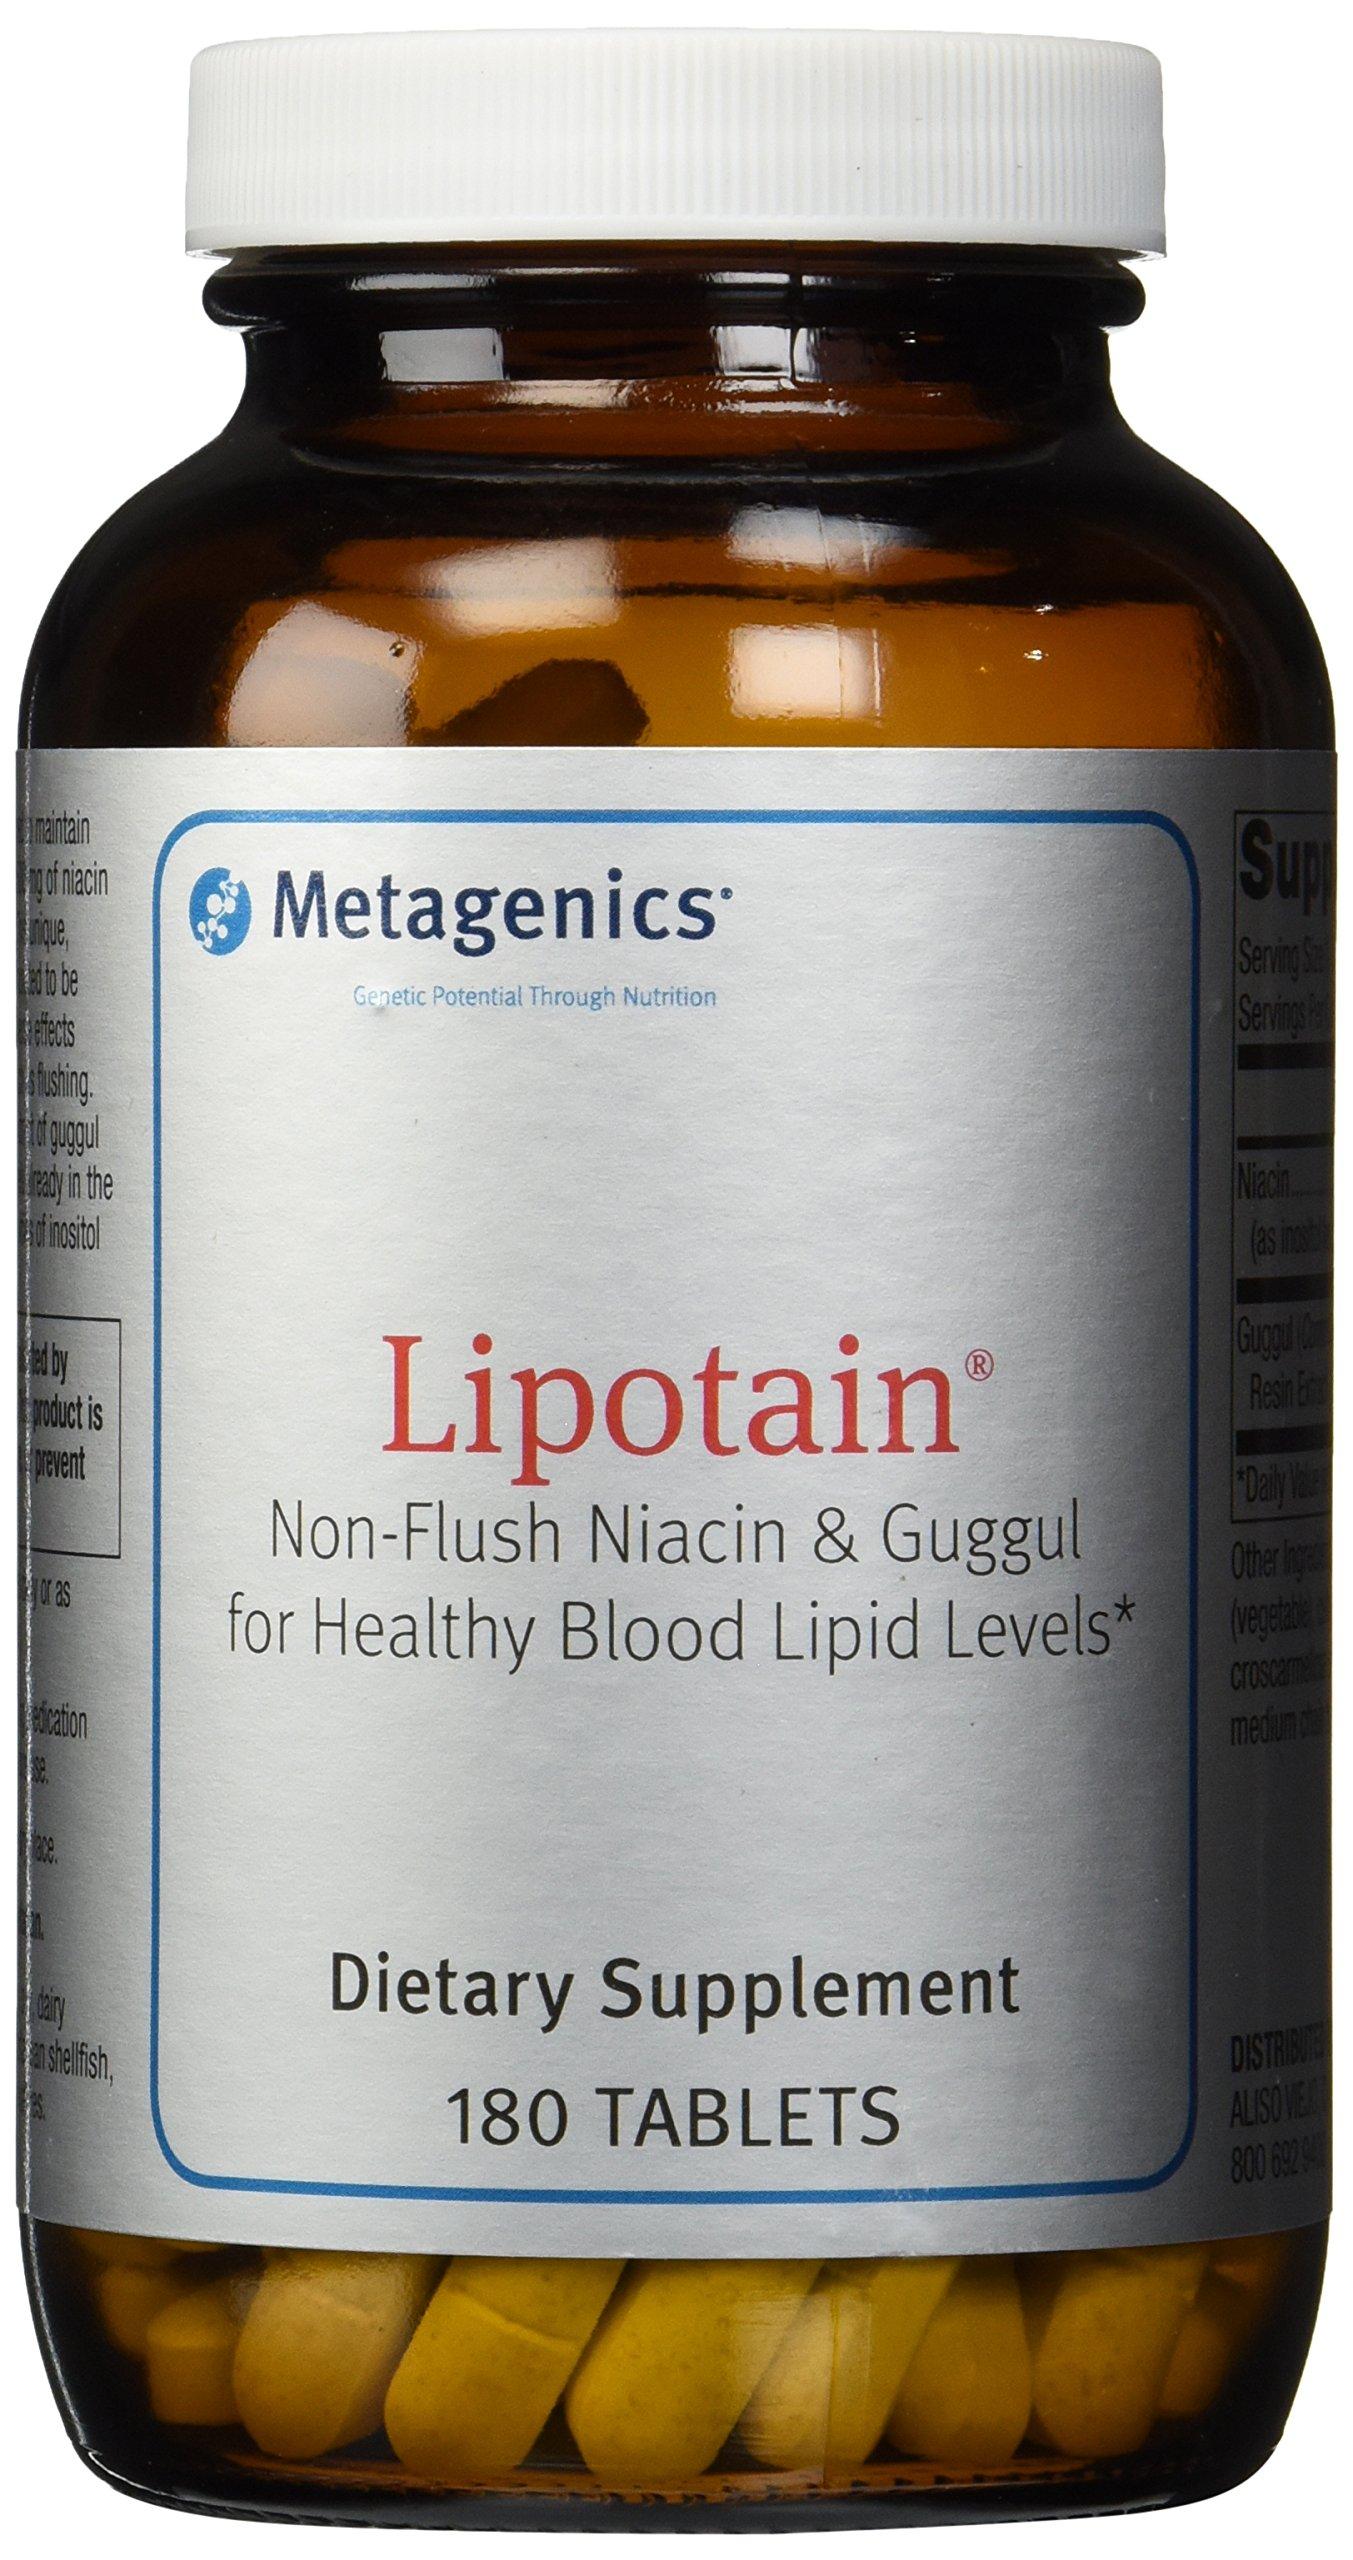 Metagenics Lipotain Dietary Supplement, 180 Count